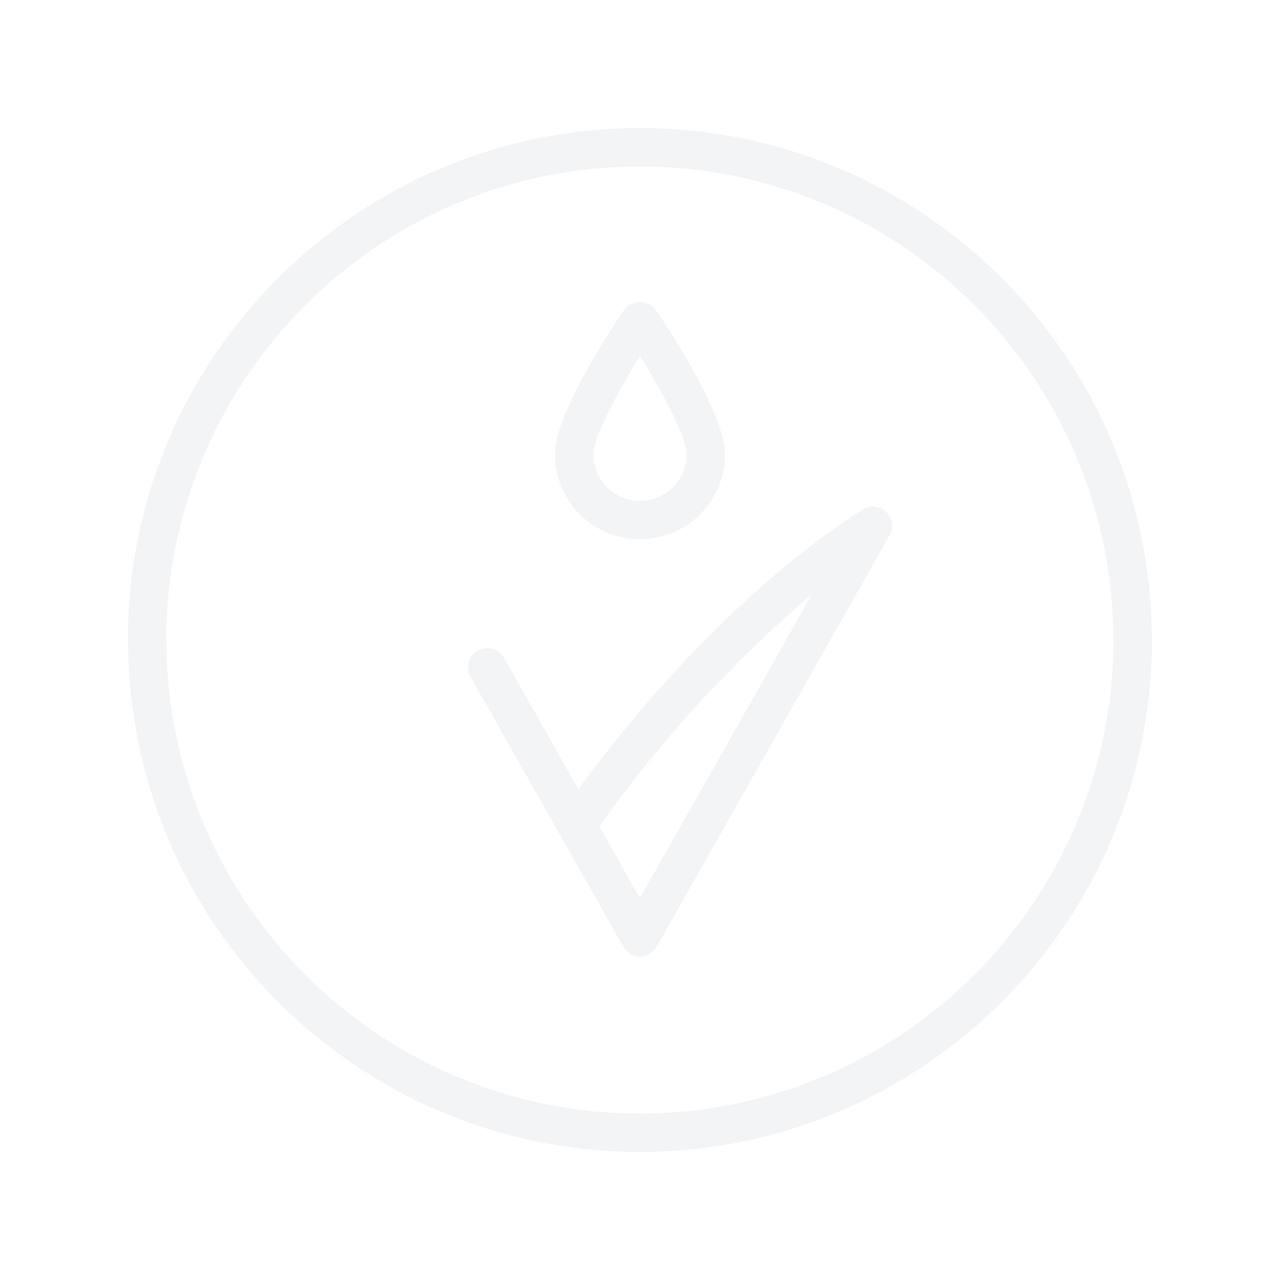 ORGANIC SHOP Lemongrass & Sugar Body Scrub 250ml